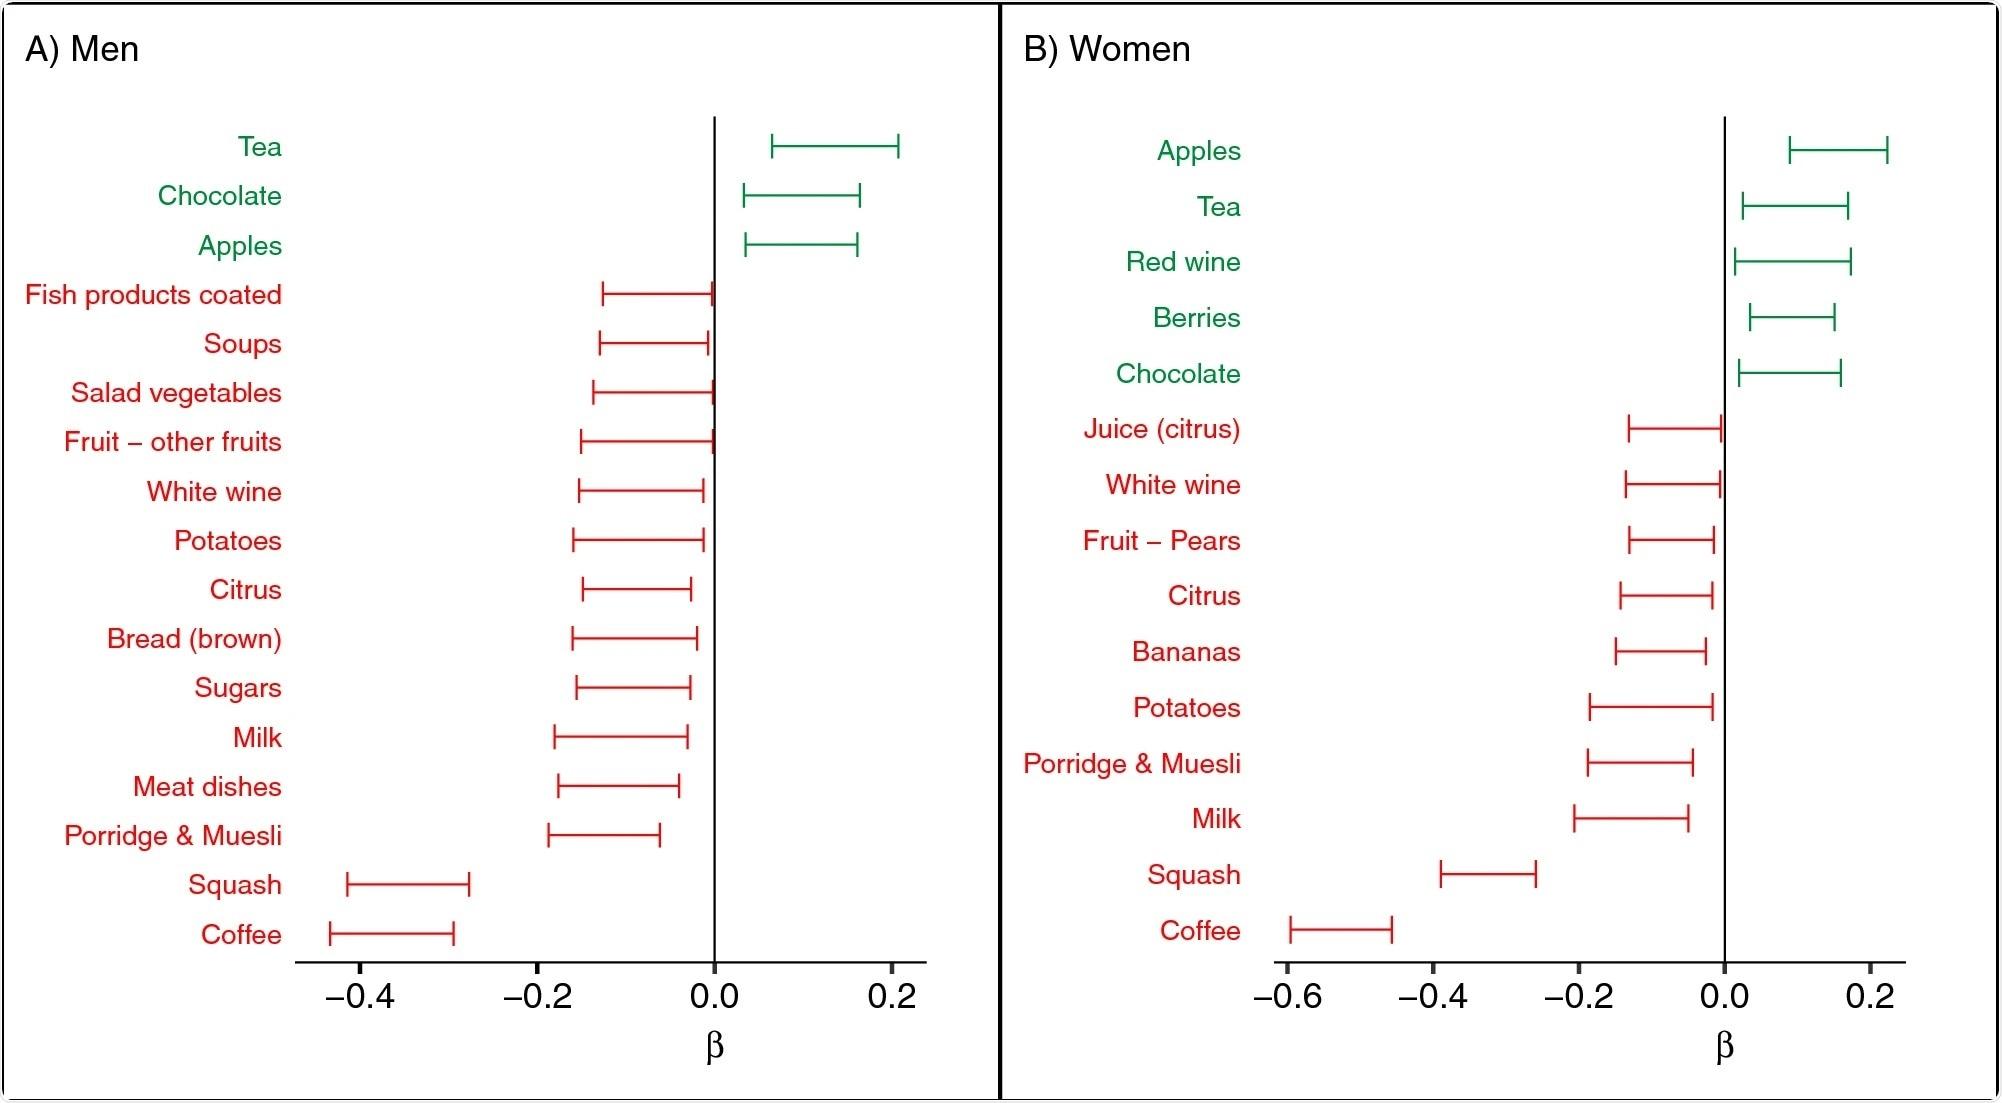 Association between biomarker-estimated flavan-3-ol intake (gVLMB) and selected food groups from 7-day diaries.